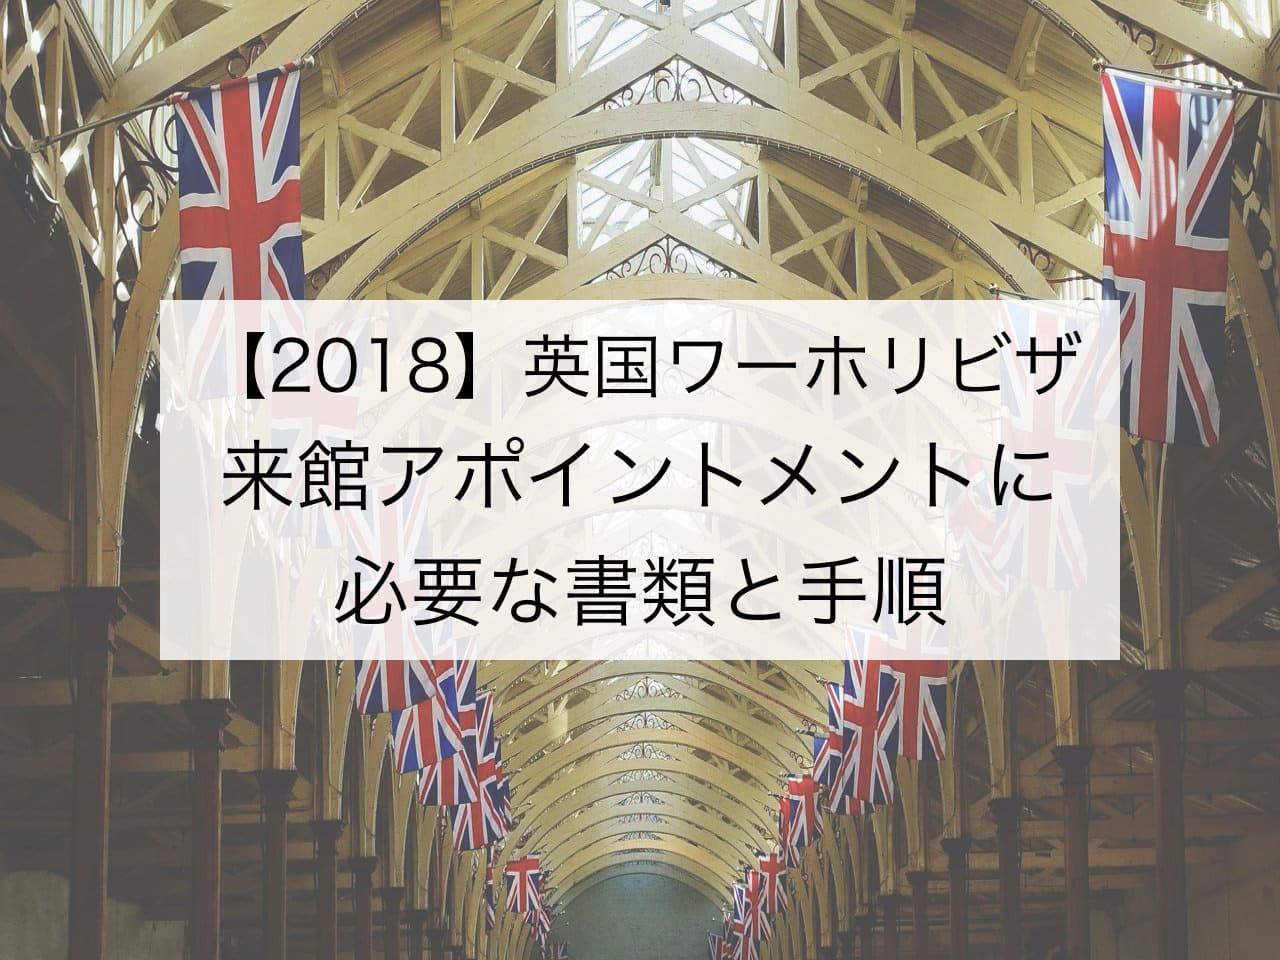 【2018】YMSビザ申請に必要な書類と来館アポイントメント【イギリスワーホリ】